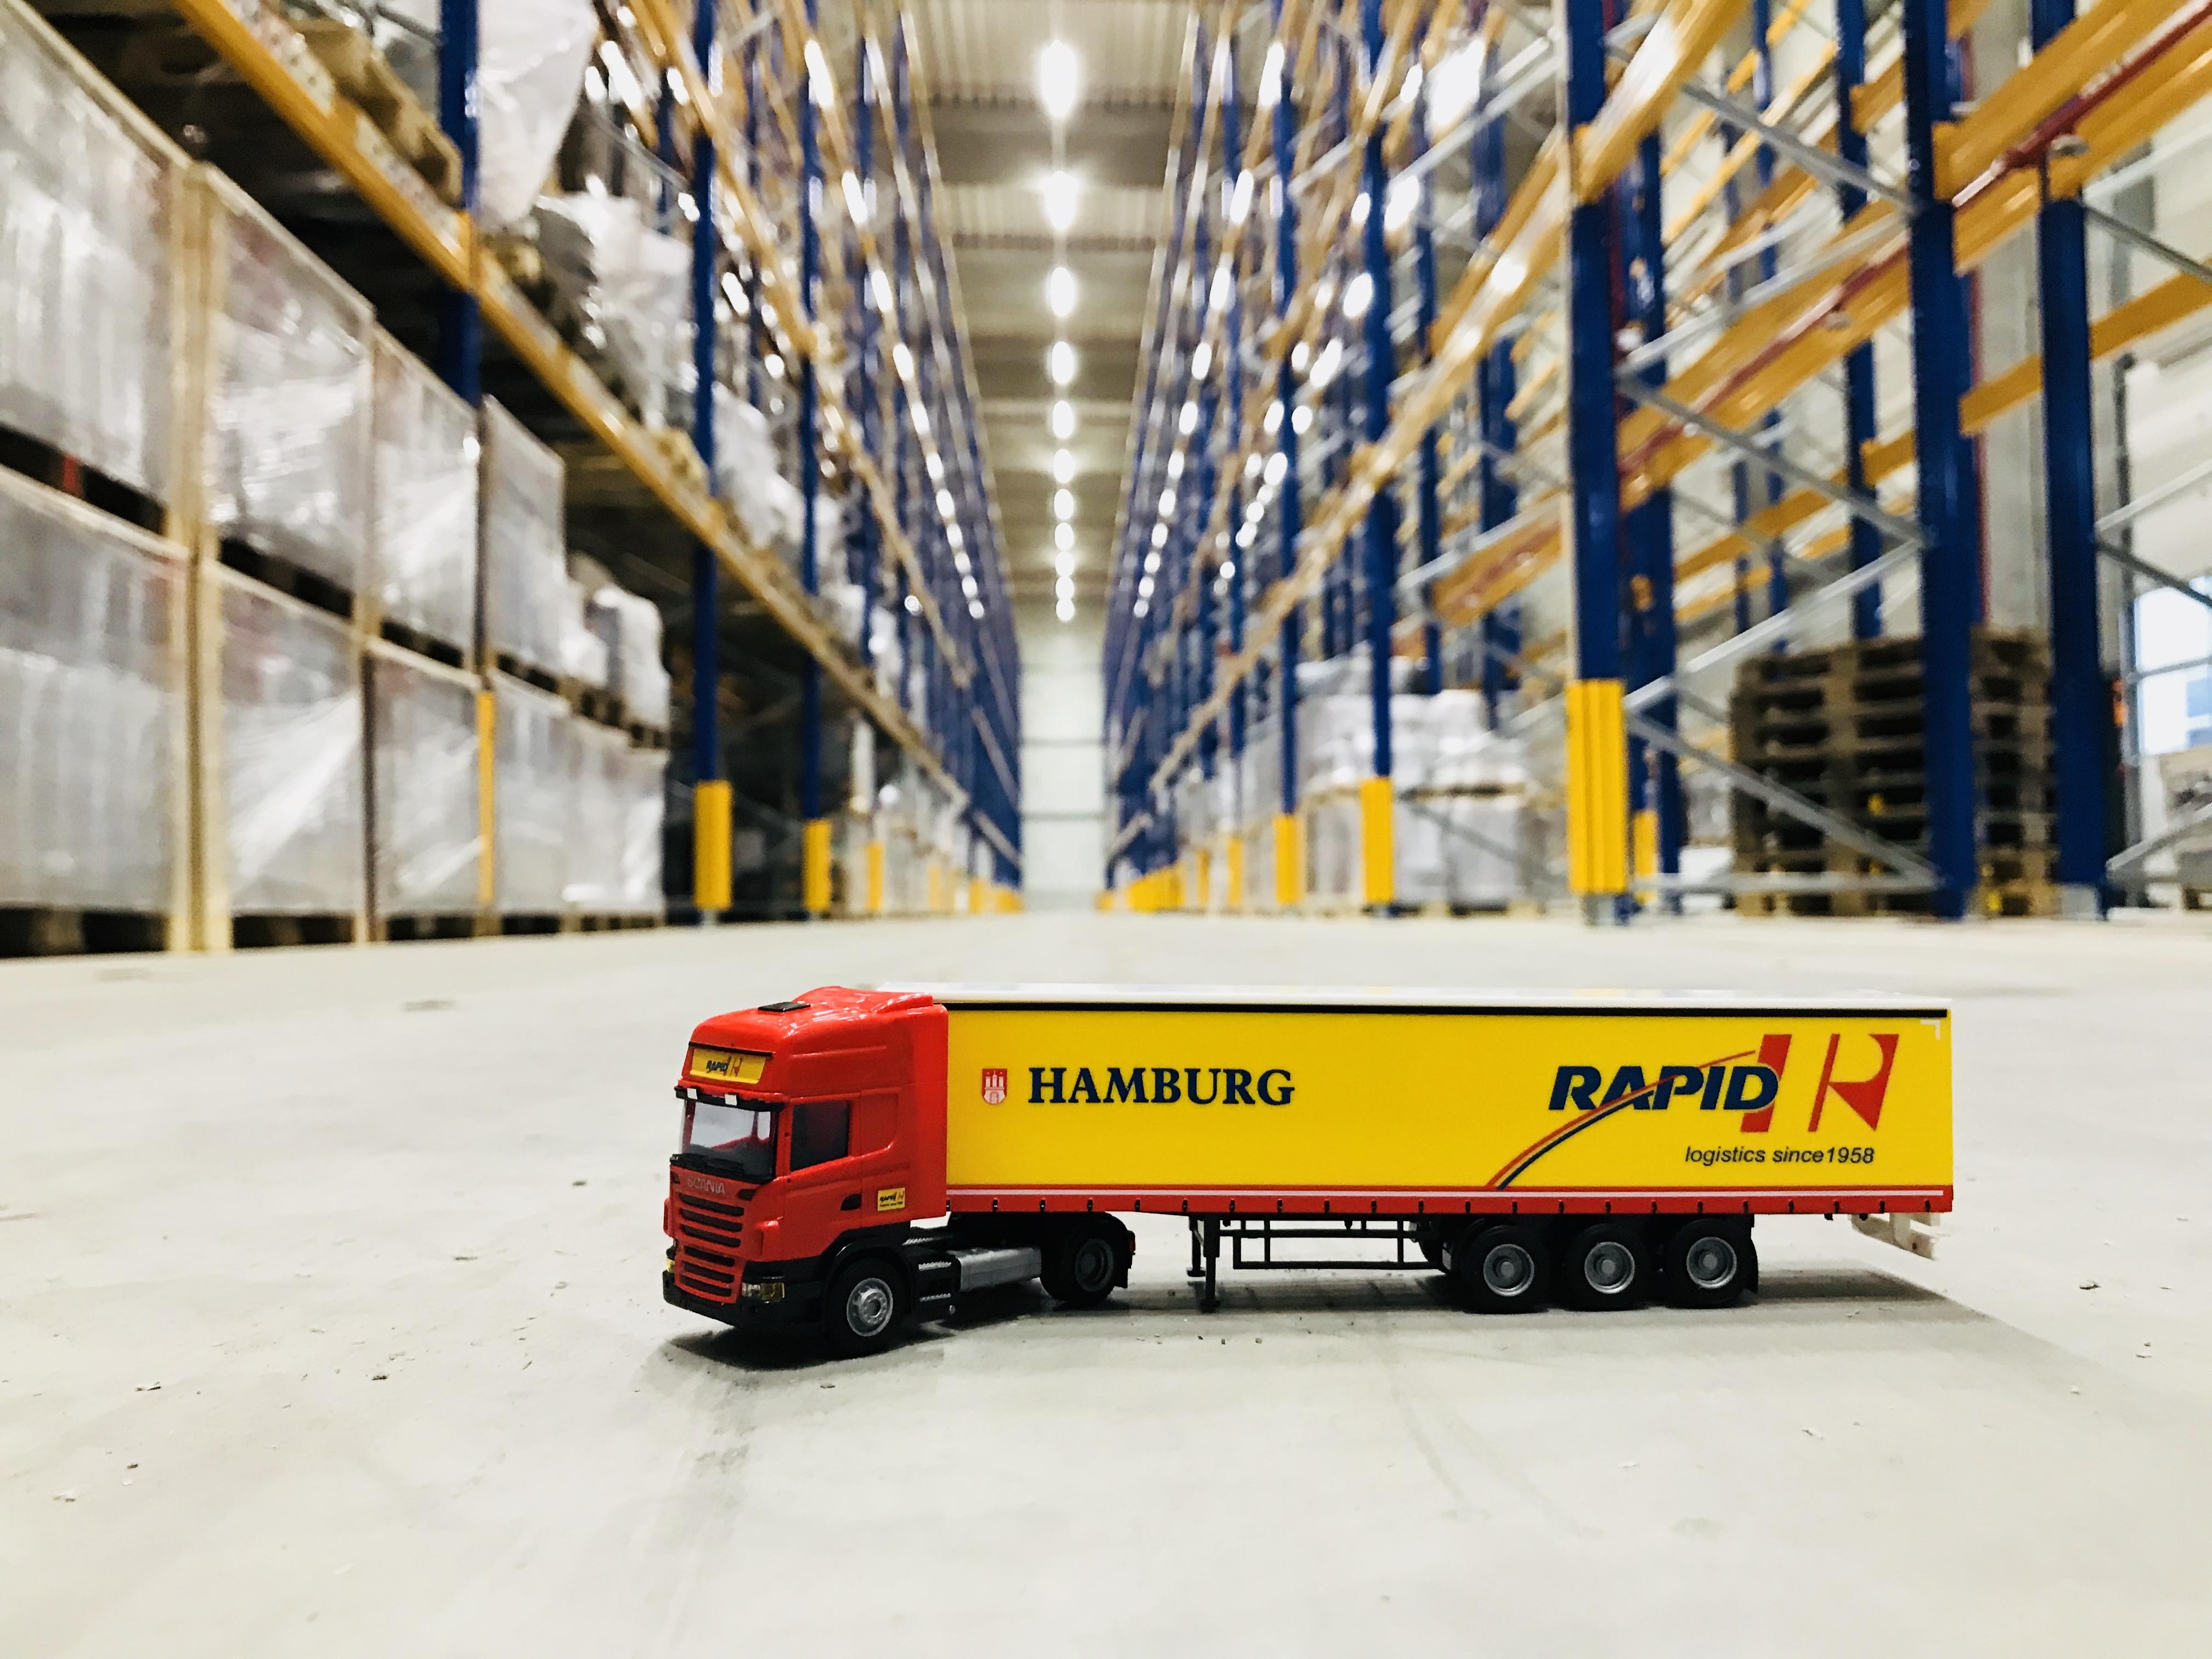 freie lagererfl che in hamburg bei der rapid logistik gruppe rapid logistics. Black Bedroom Furniture Sets. Home Design Ideas